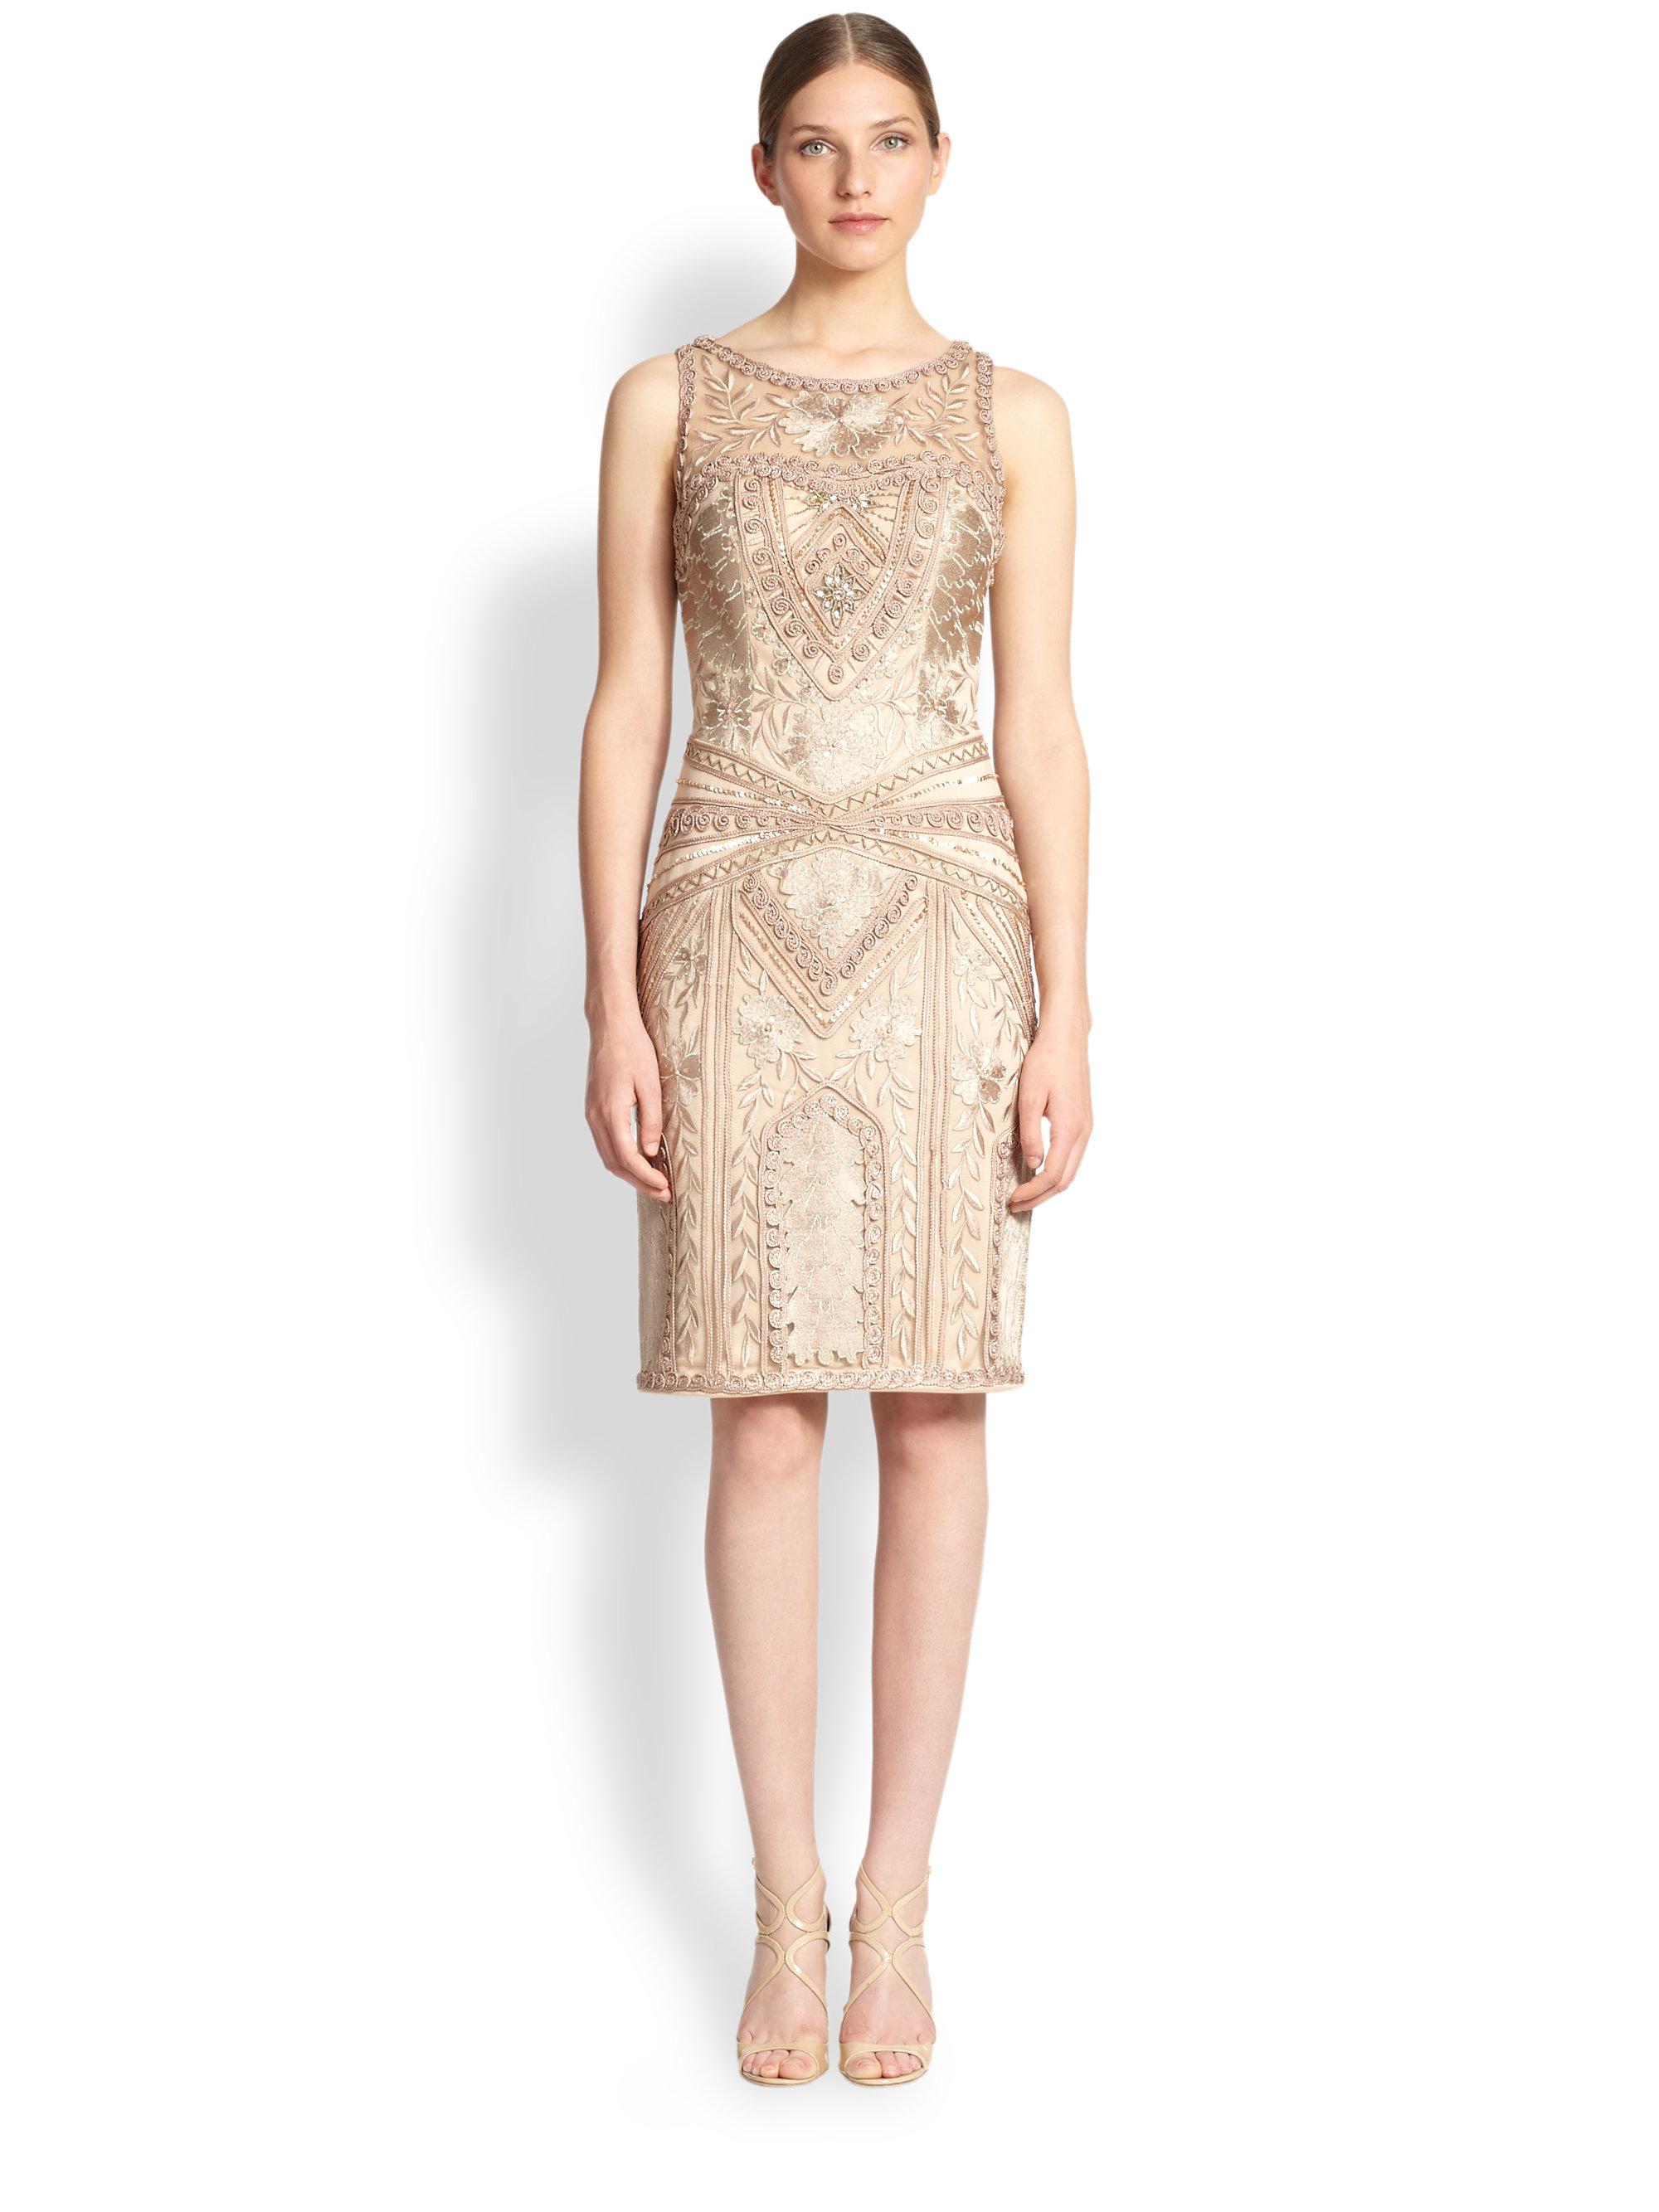 3ebcdba8057 Lyst - Sue Wong Embroidered Sheath Dress in Metallic